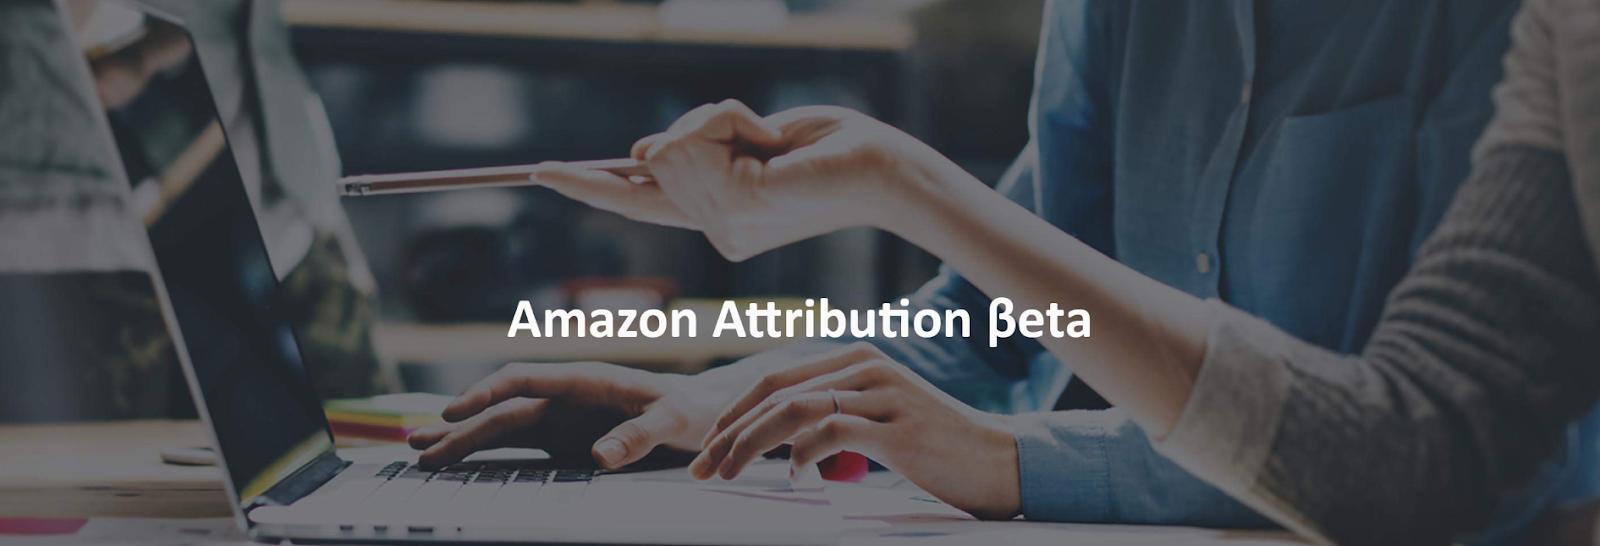 Amazon Attribution Beta